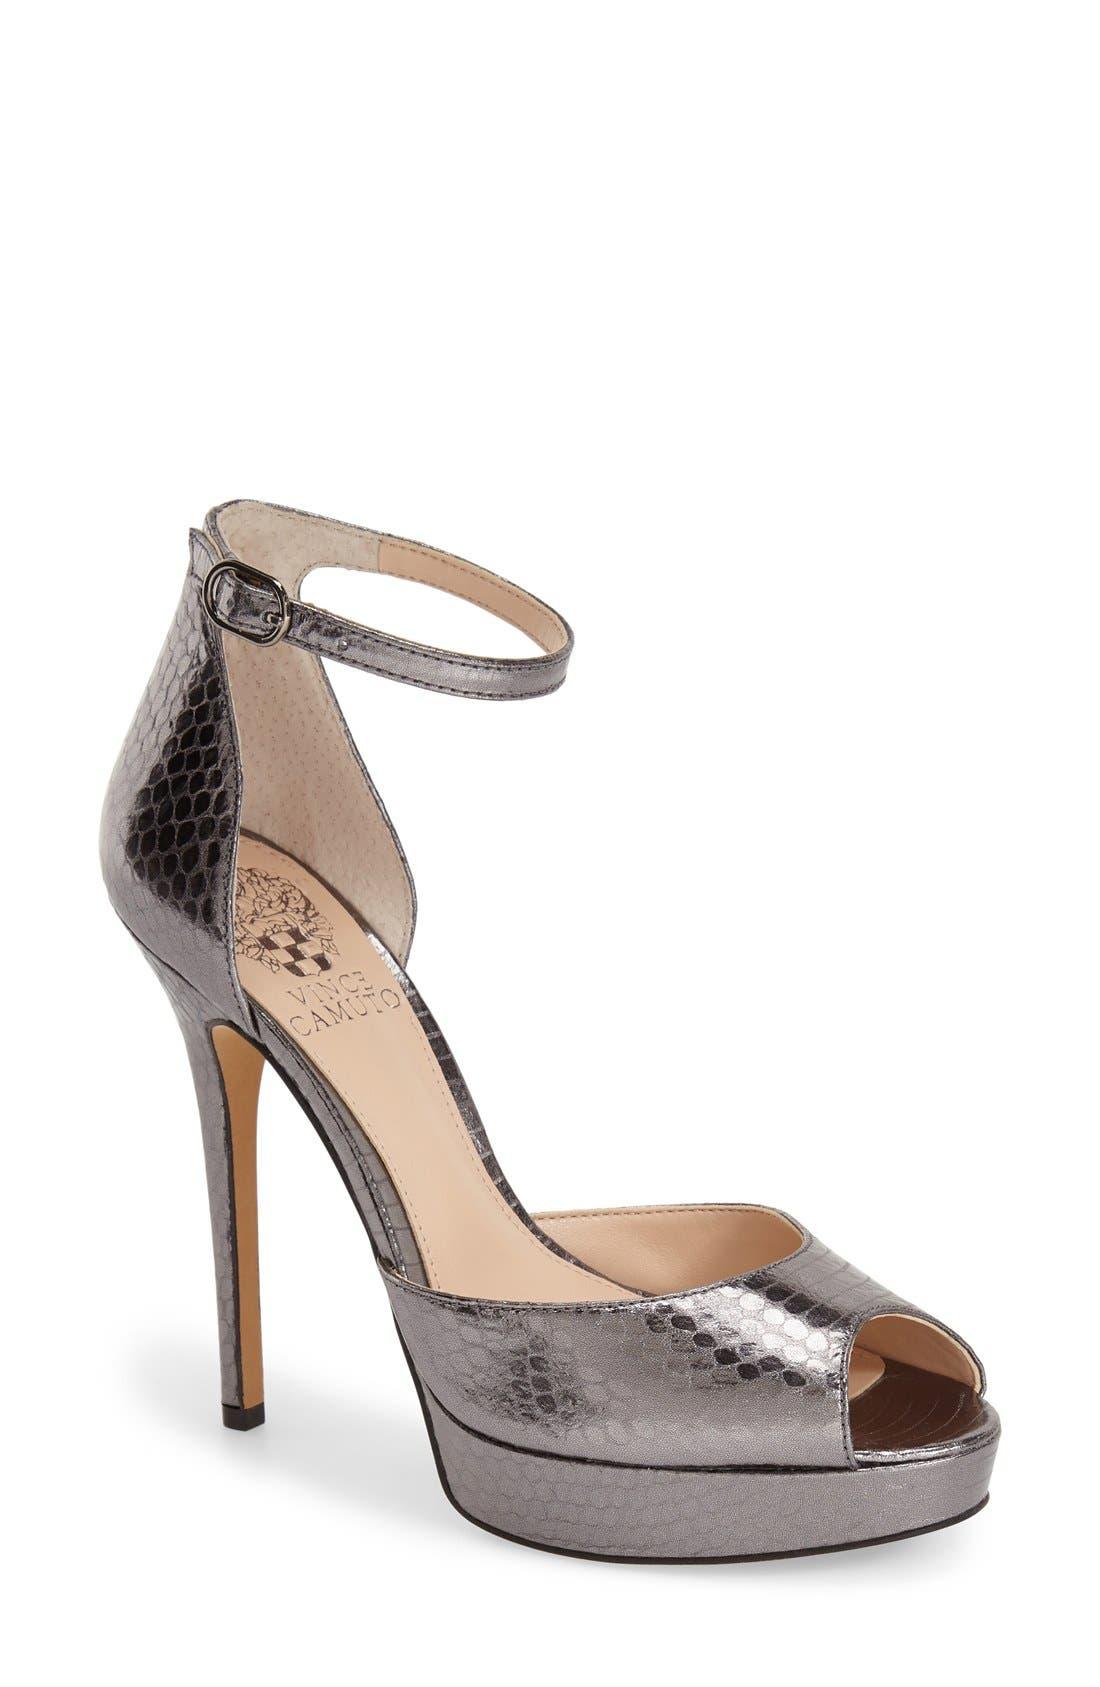 Main Image - Vince Camuto 'Lillith' Ankle Strap Platform Pump (Women)